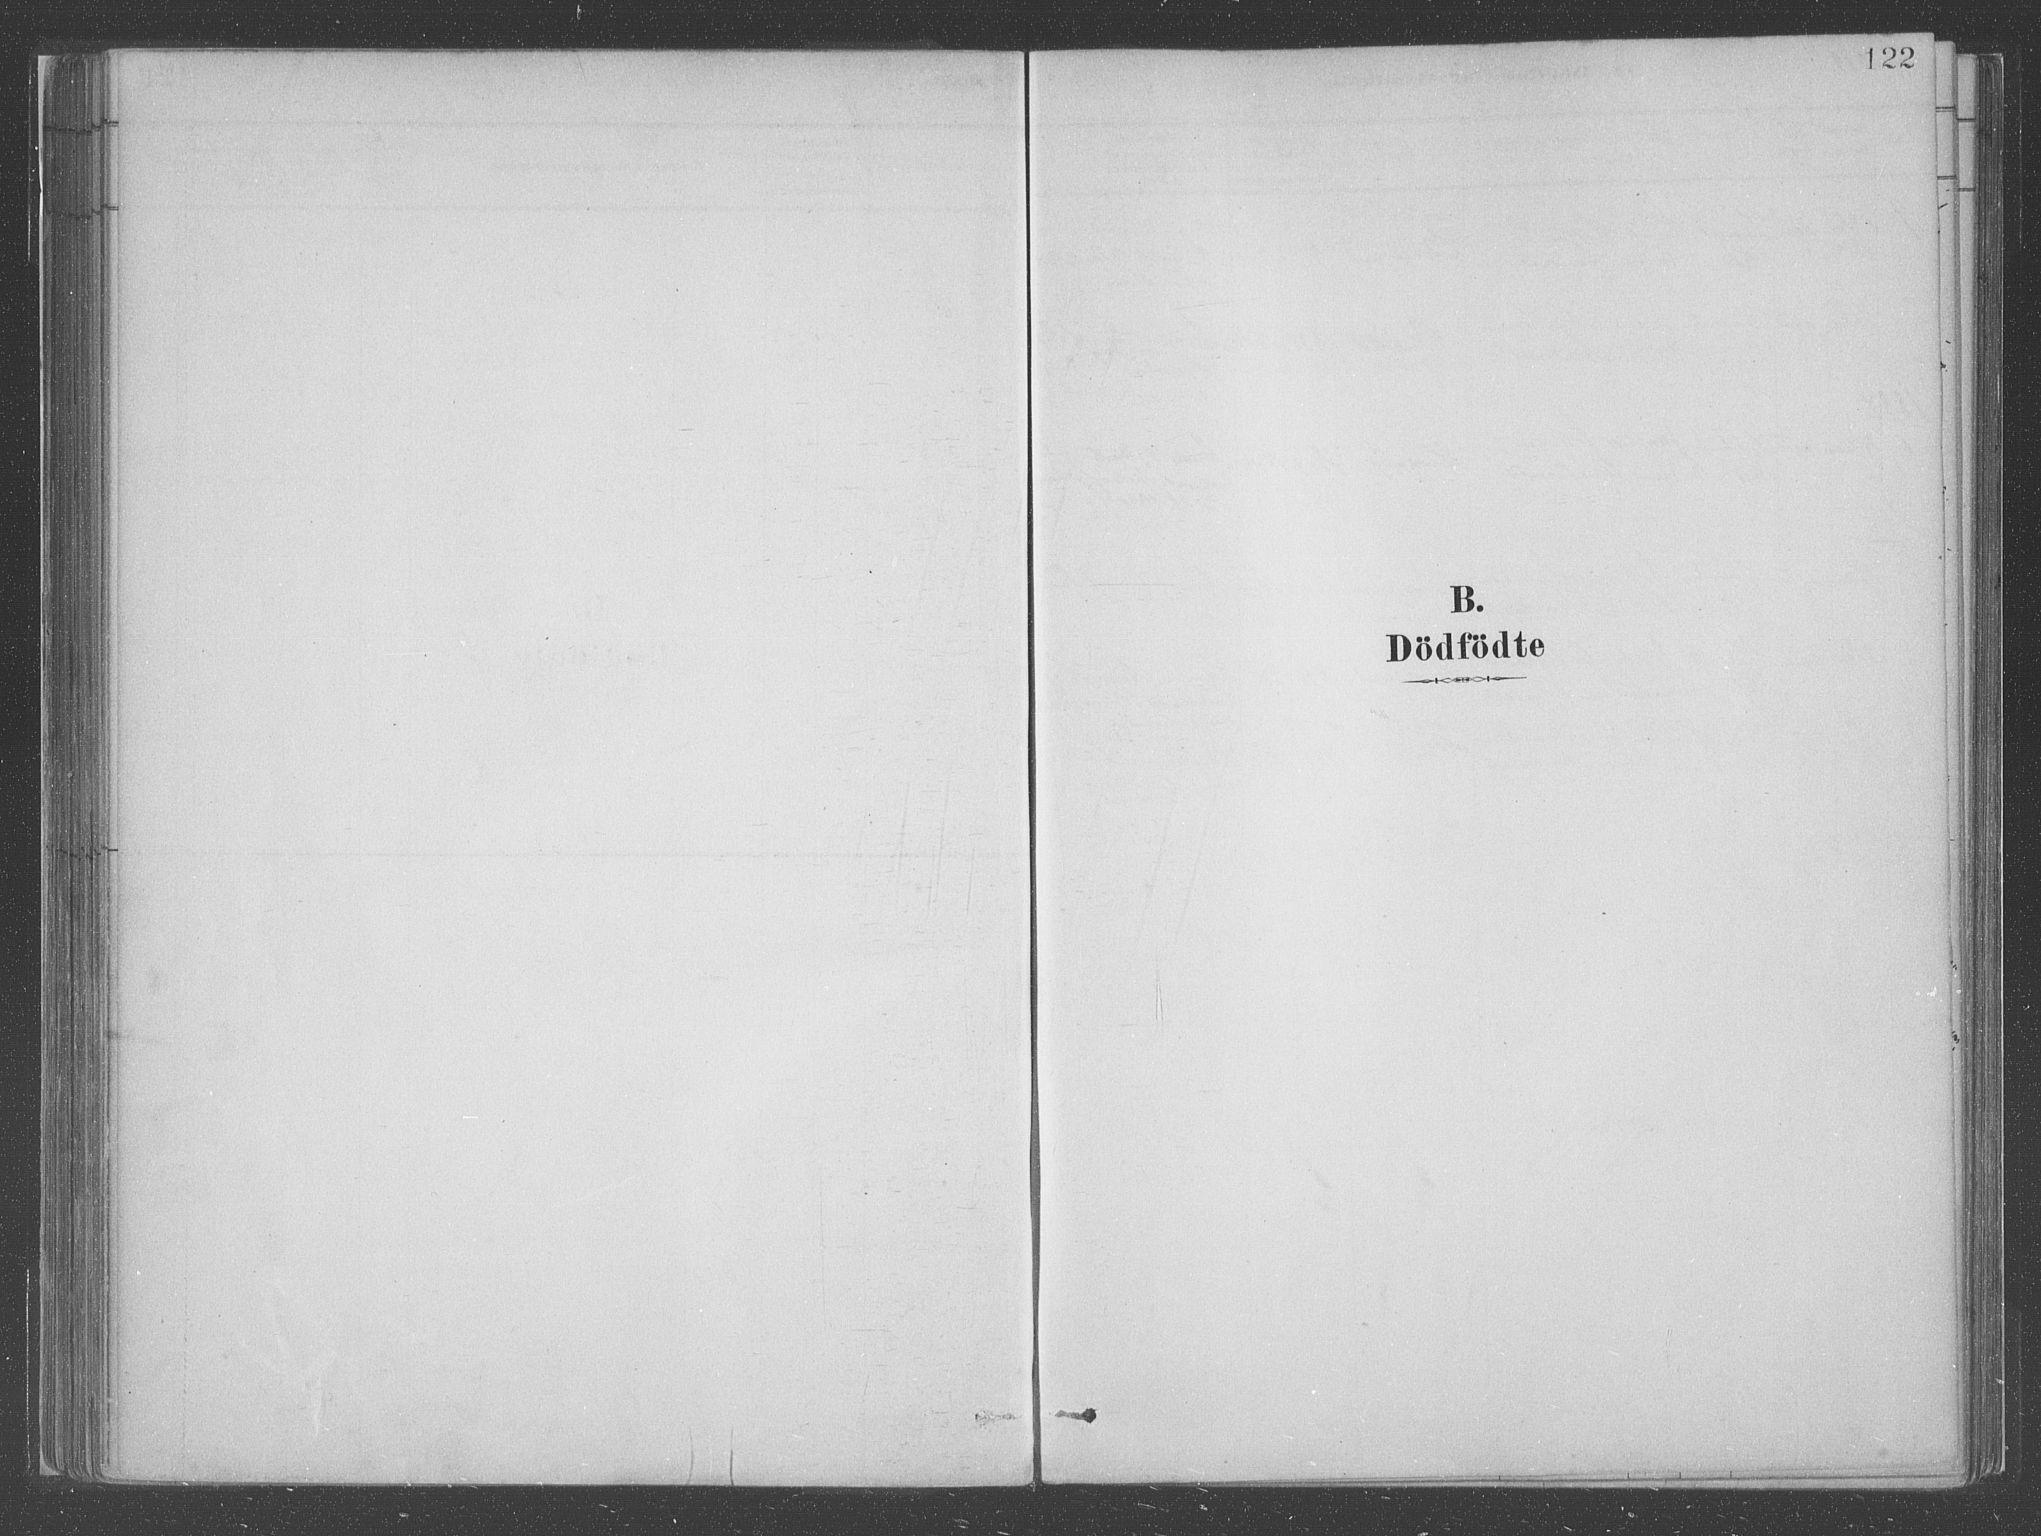 SAB, Askvoll sokneprestembete, H/Haa/Haac/L0001: Parish register (official) no. C  1, 1879-1922, p. 122